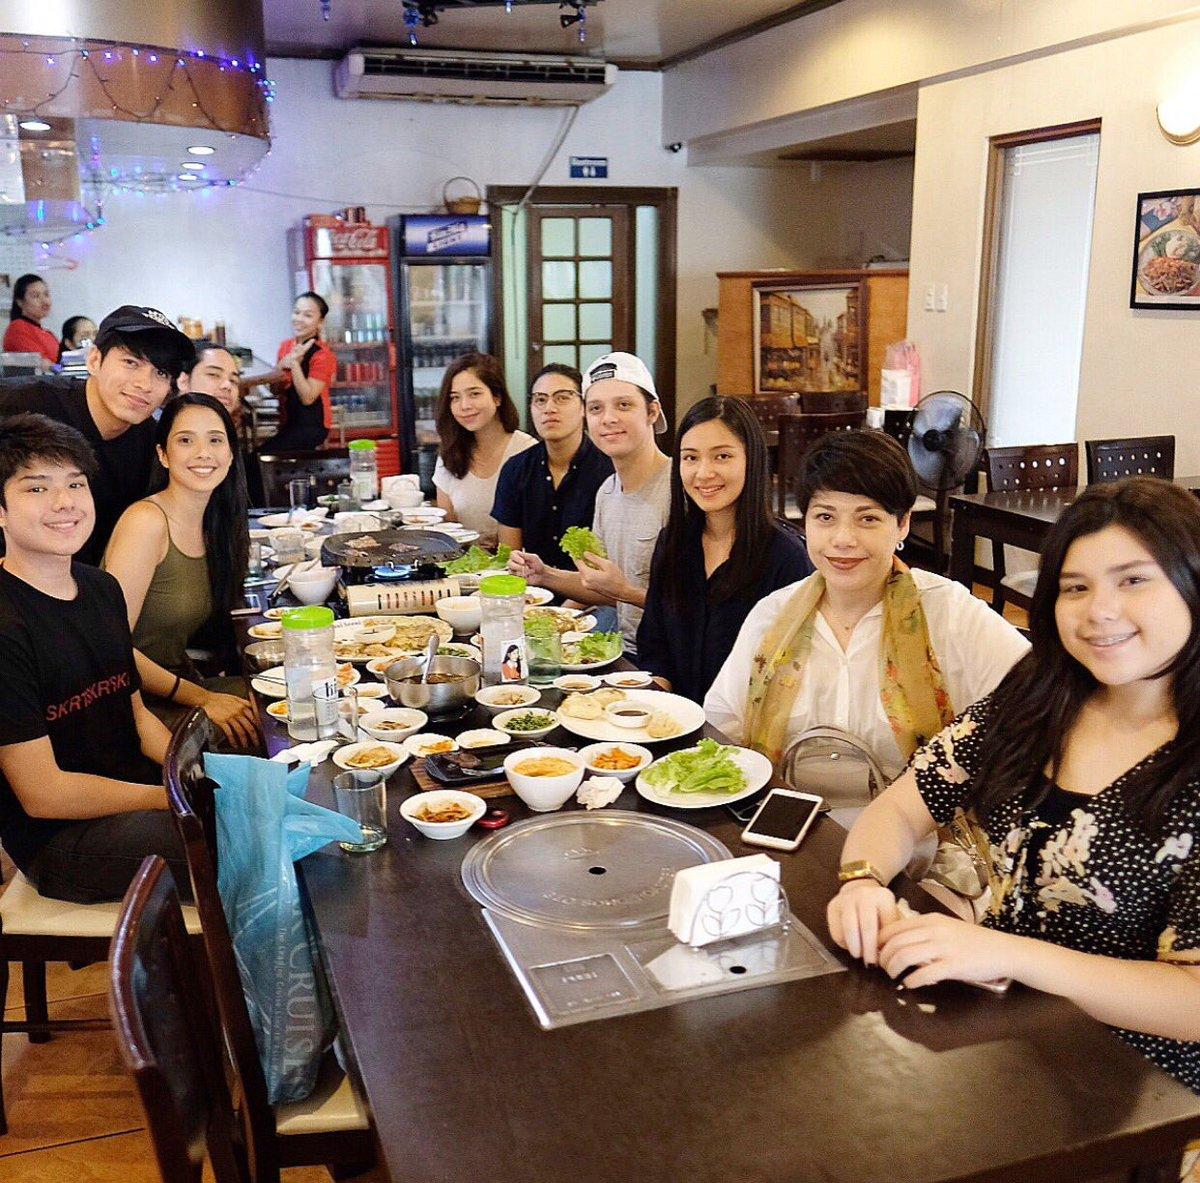 Celebrated their kuya Nicolo's 32nd birthday   © Ms. @piamagalona & @maxenemagalona IG  #Magalona @LucianoArkin @claramags @saabmagalonapic.twitter.com/4qwaQndypn